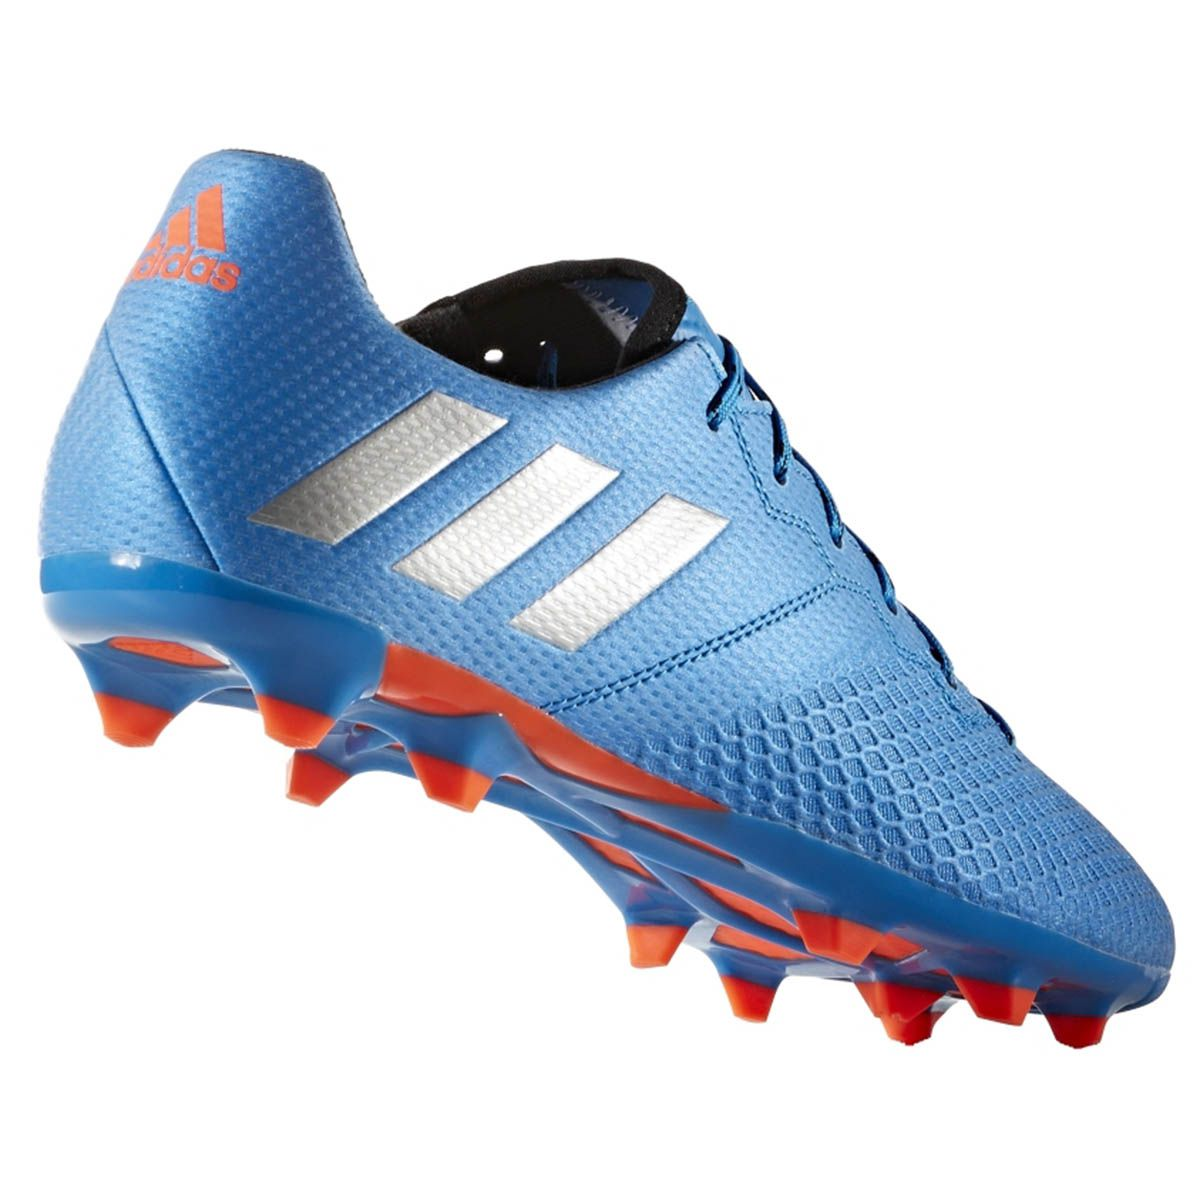 Chuteira Adidas Messi 16.3 FG - Stigli 424fe43e48f1f